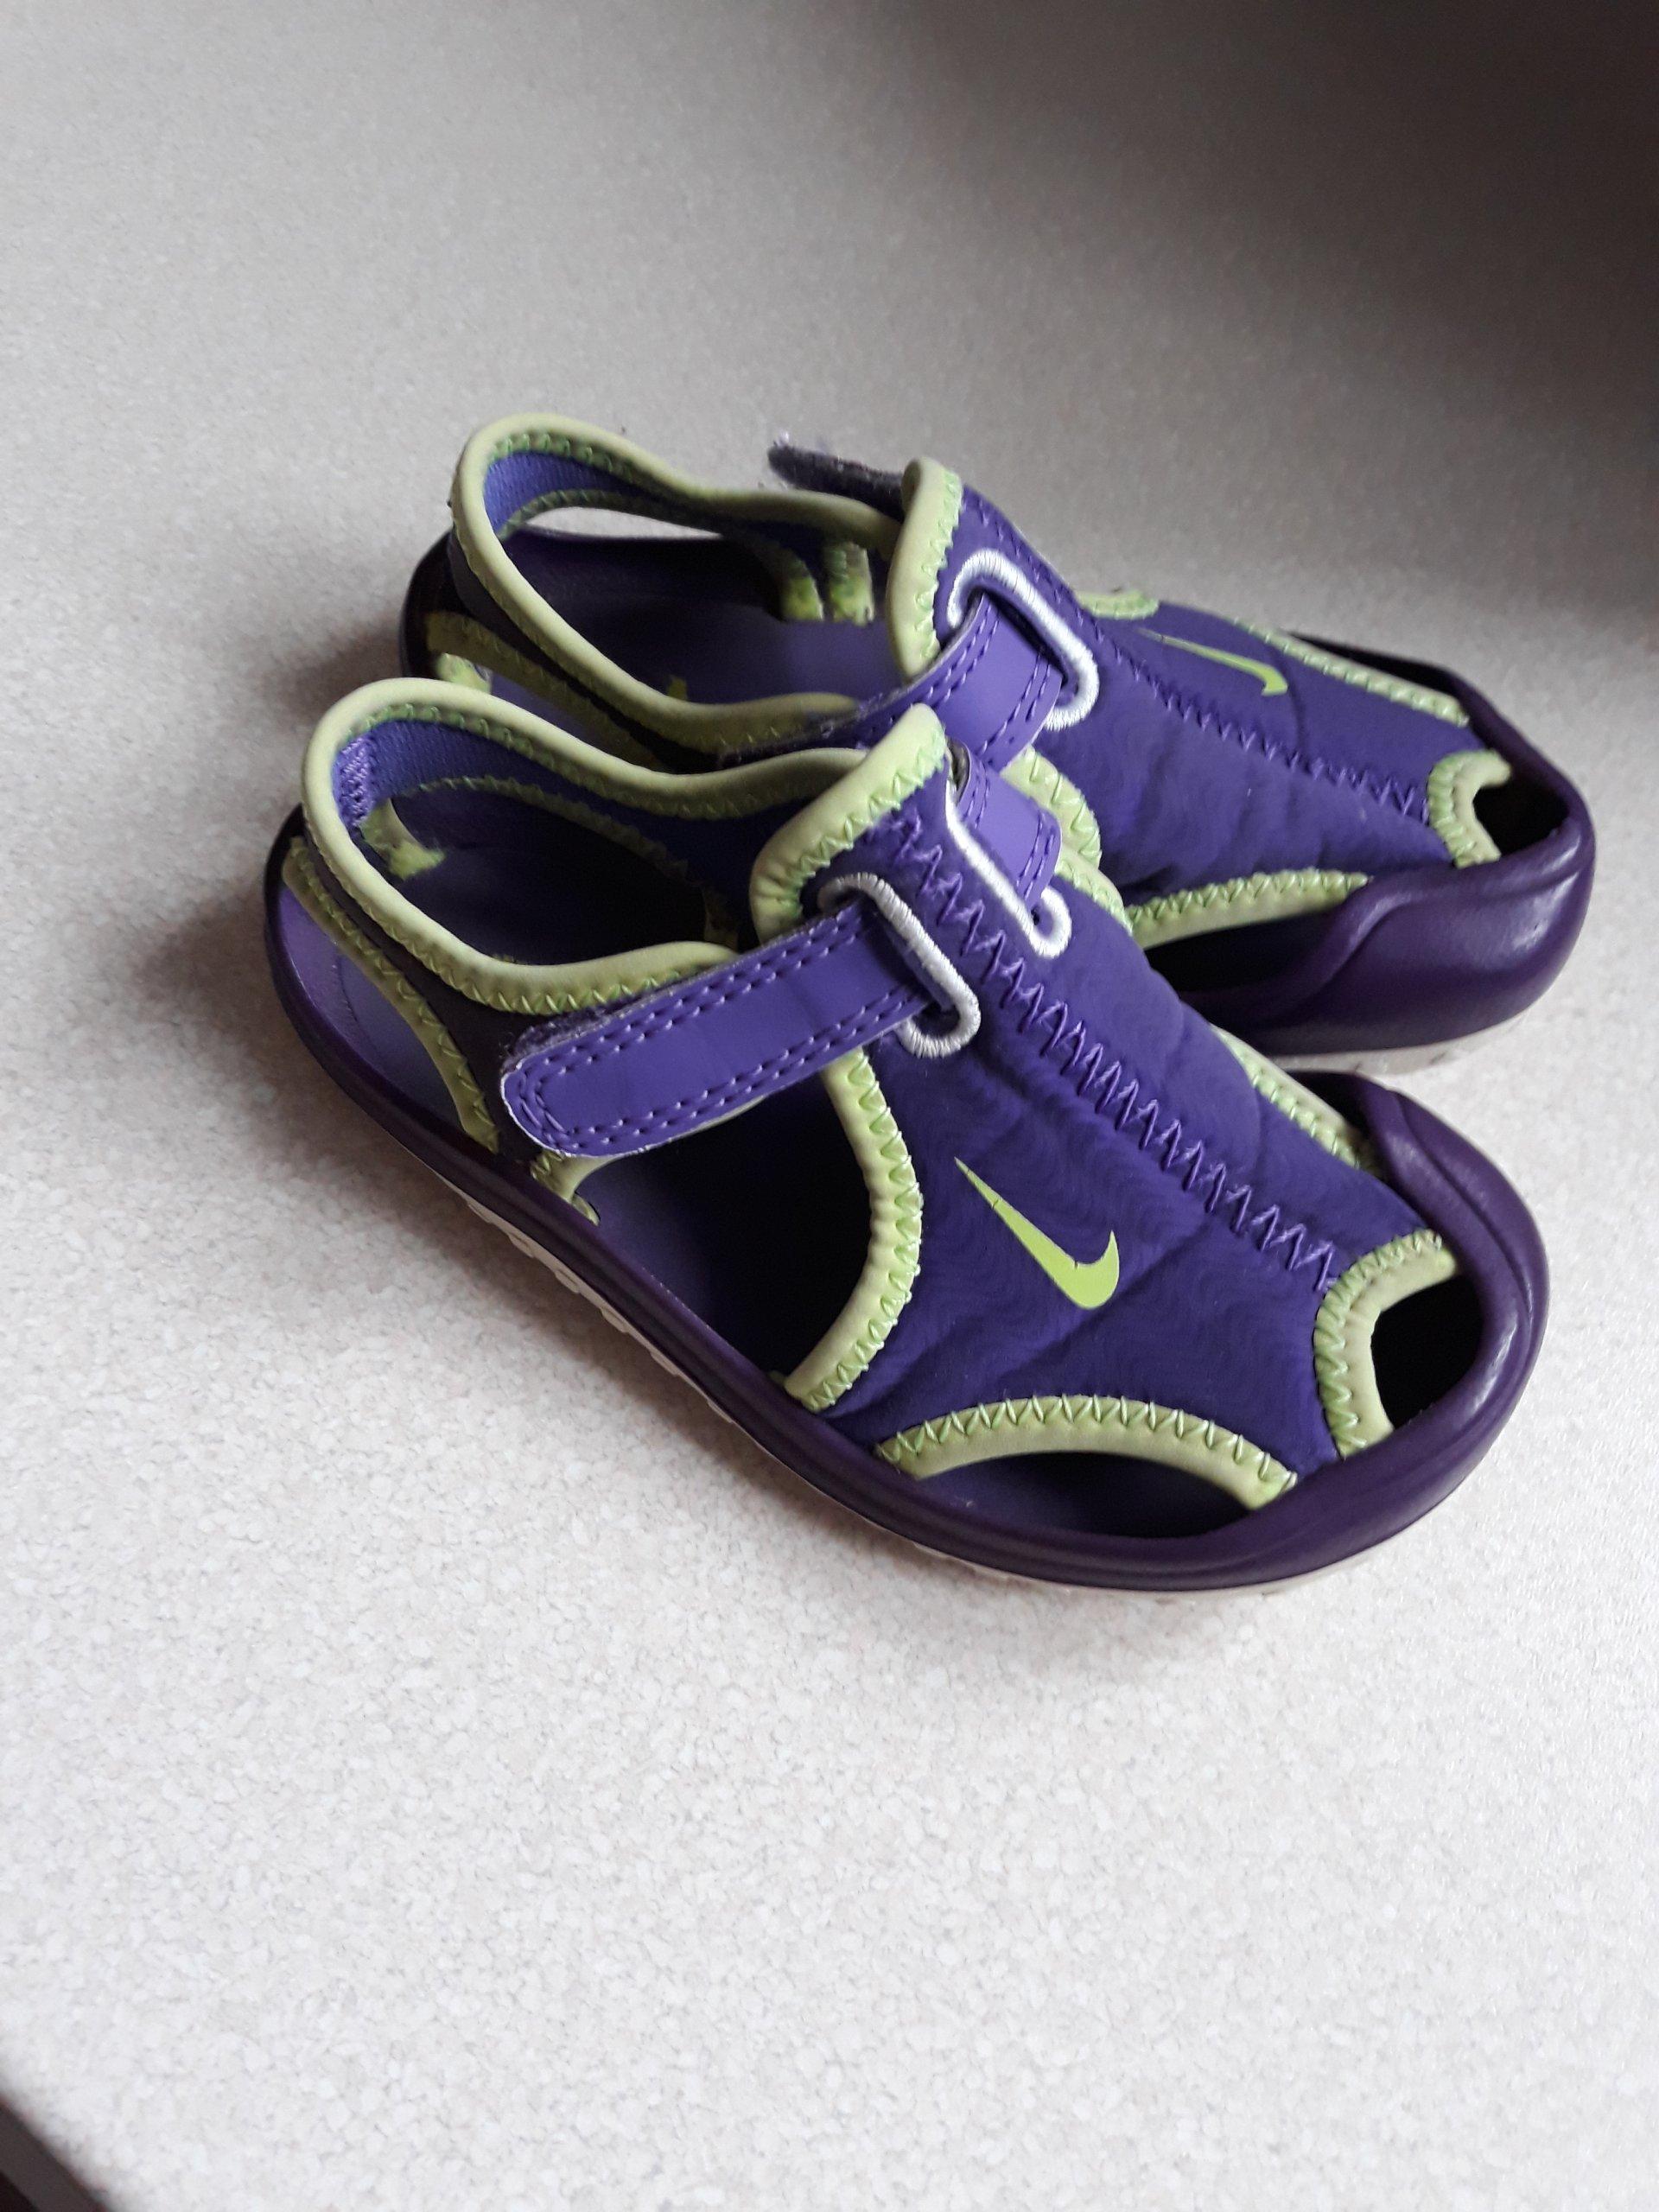 3c99c802486c Sandały Nike Sunray Protect r. 23 - 7291304266 - oficjalne archiwum ...